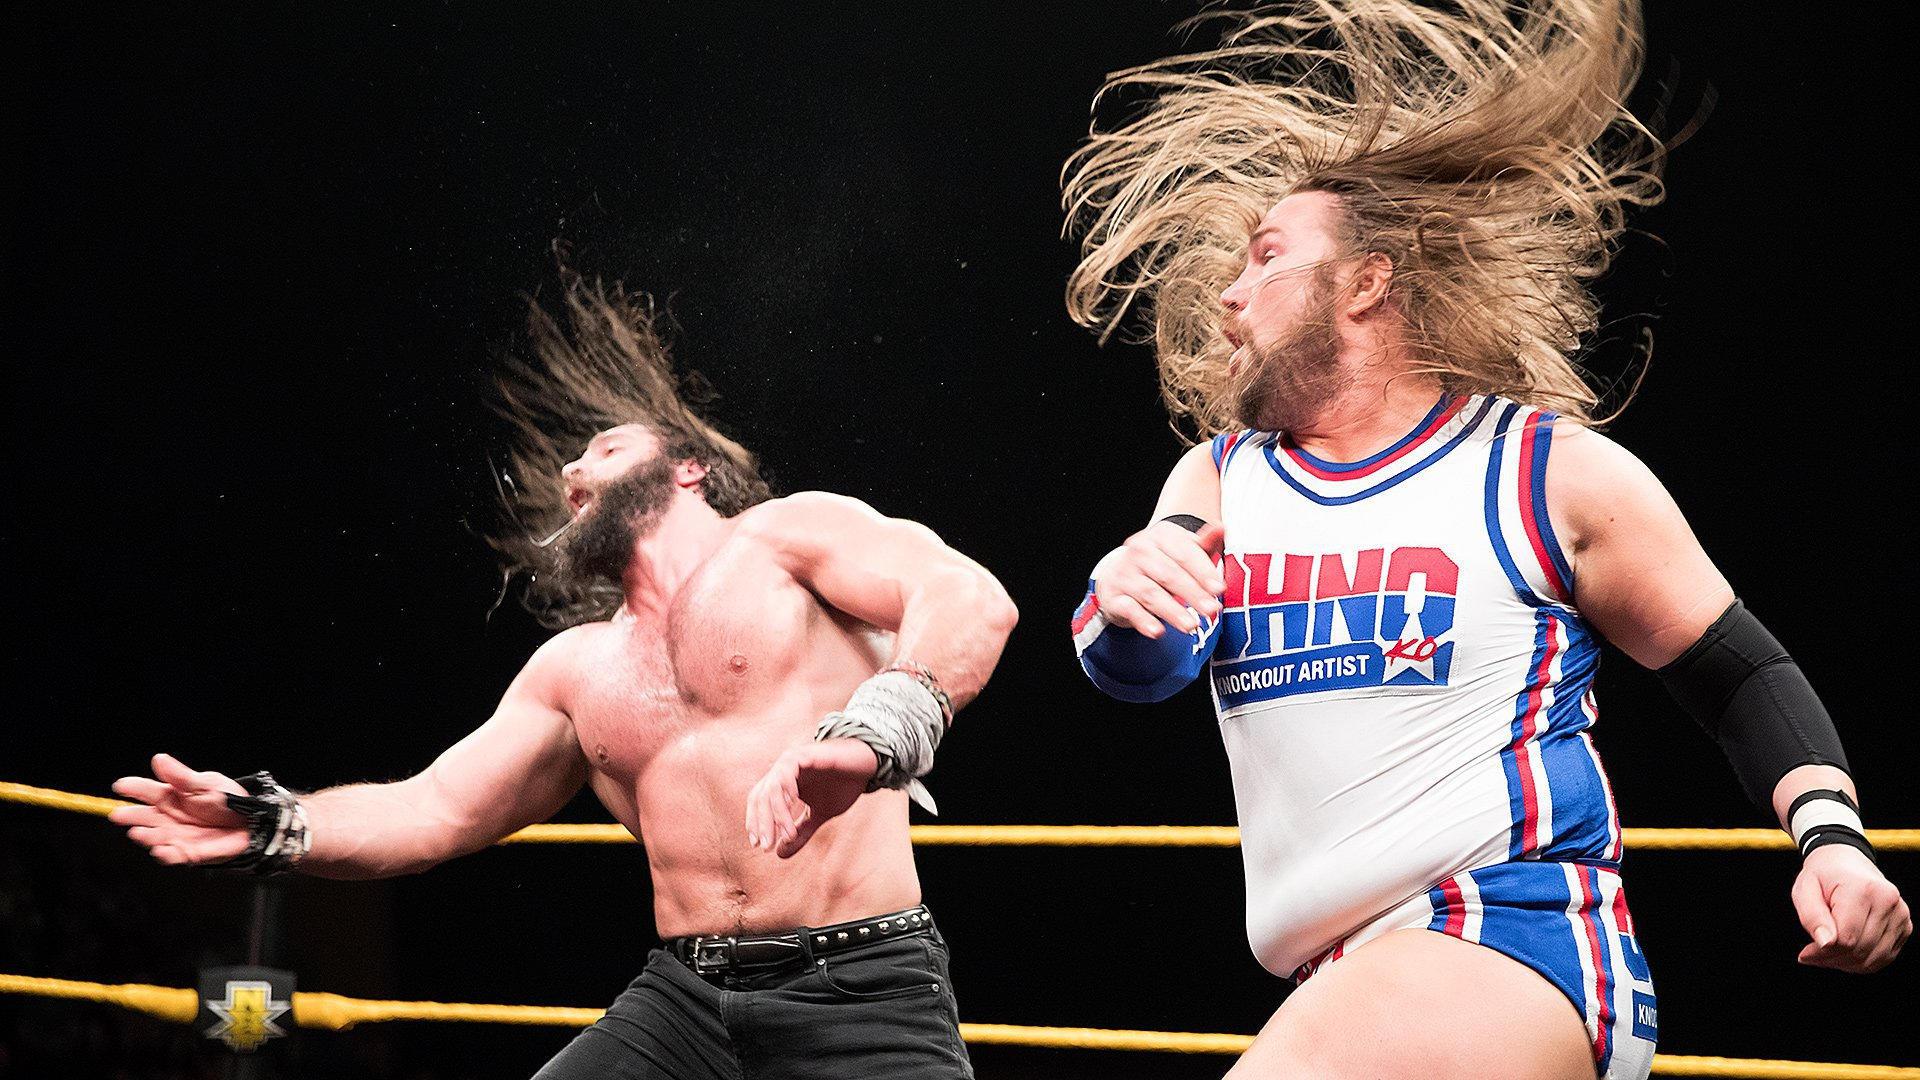 Resultats WWE NXT 29 mars 2017